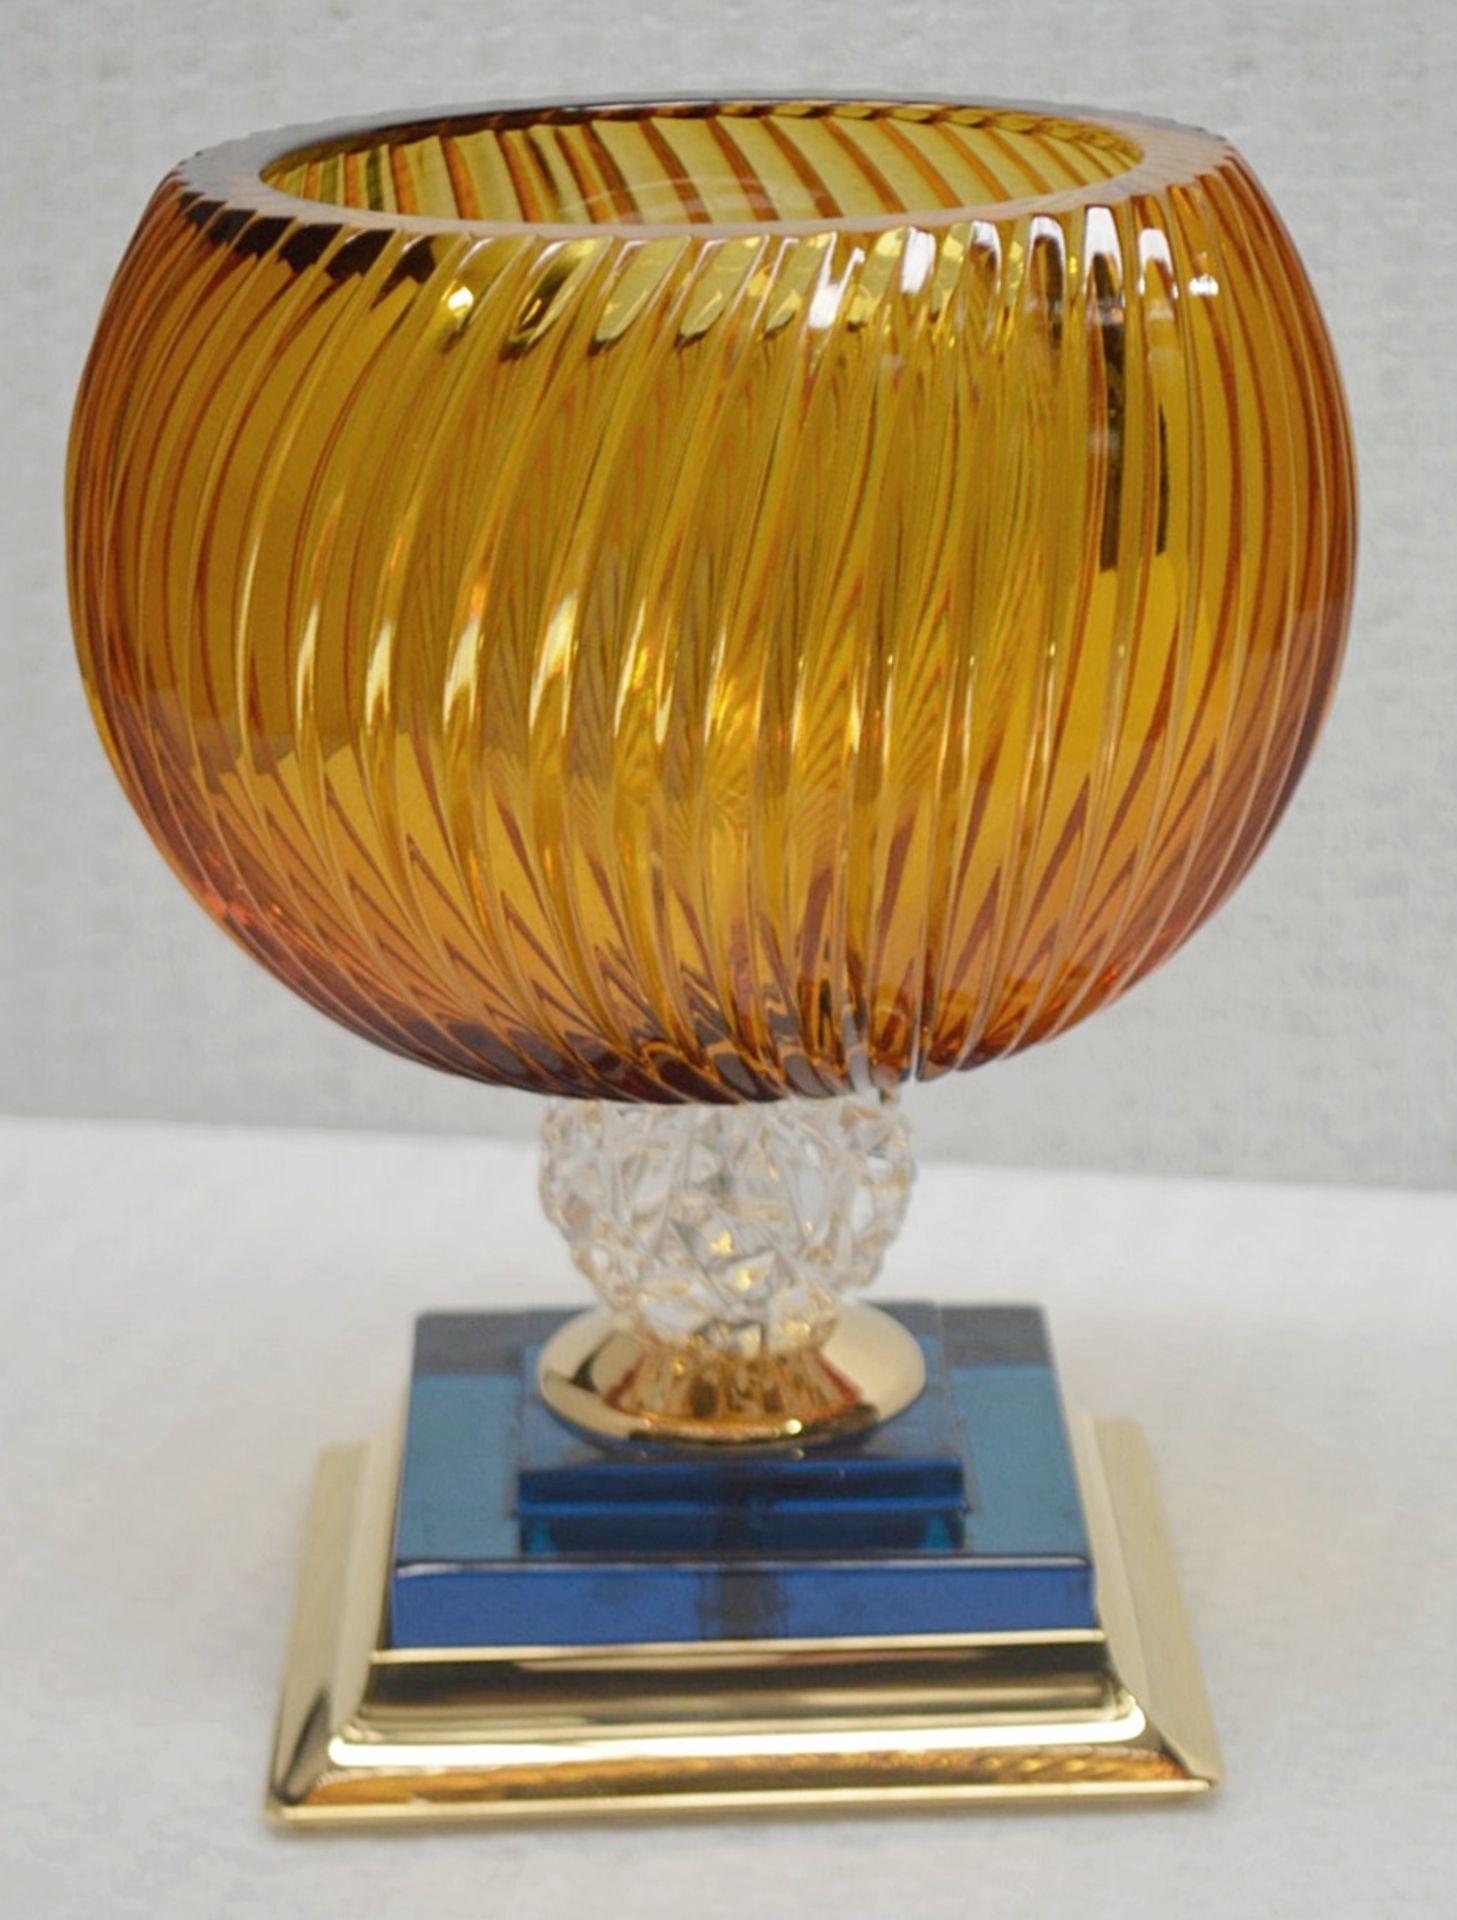 1 x BALDI 'Home Jewels' Italian Hand-crafted Artisan Coccinella Cup, In Orange & Blue Charme